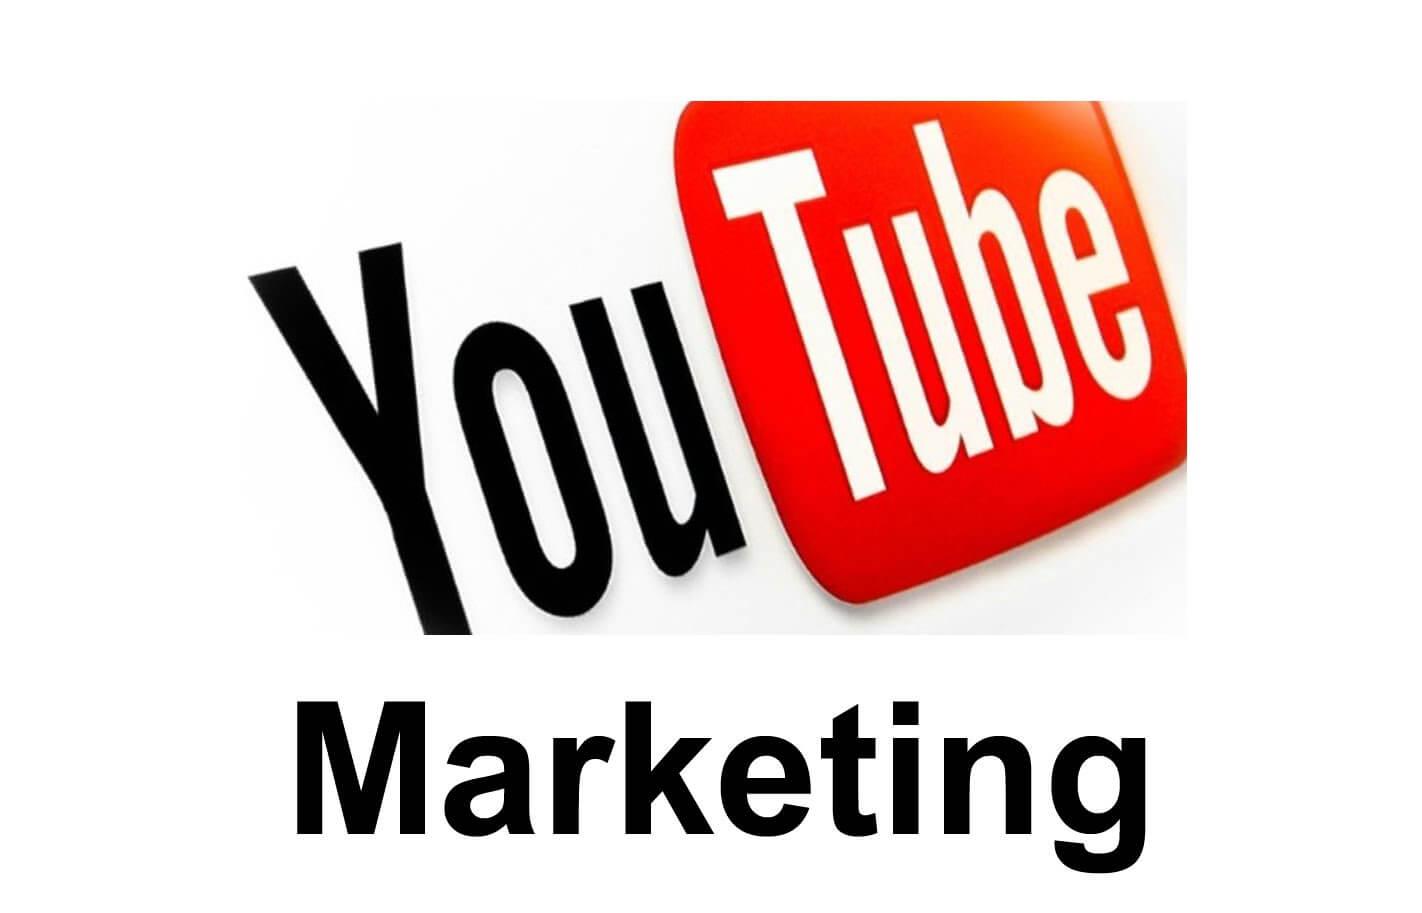 YouTube মার্কেটিং কি ?